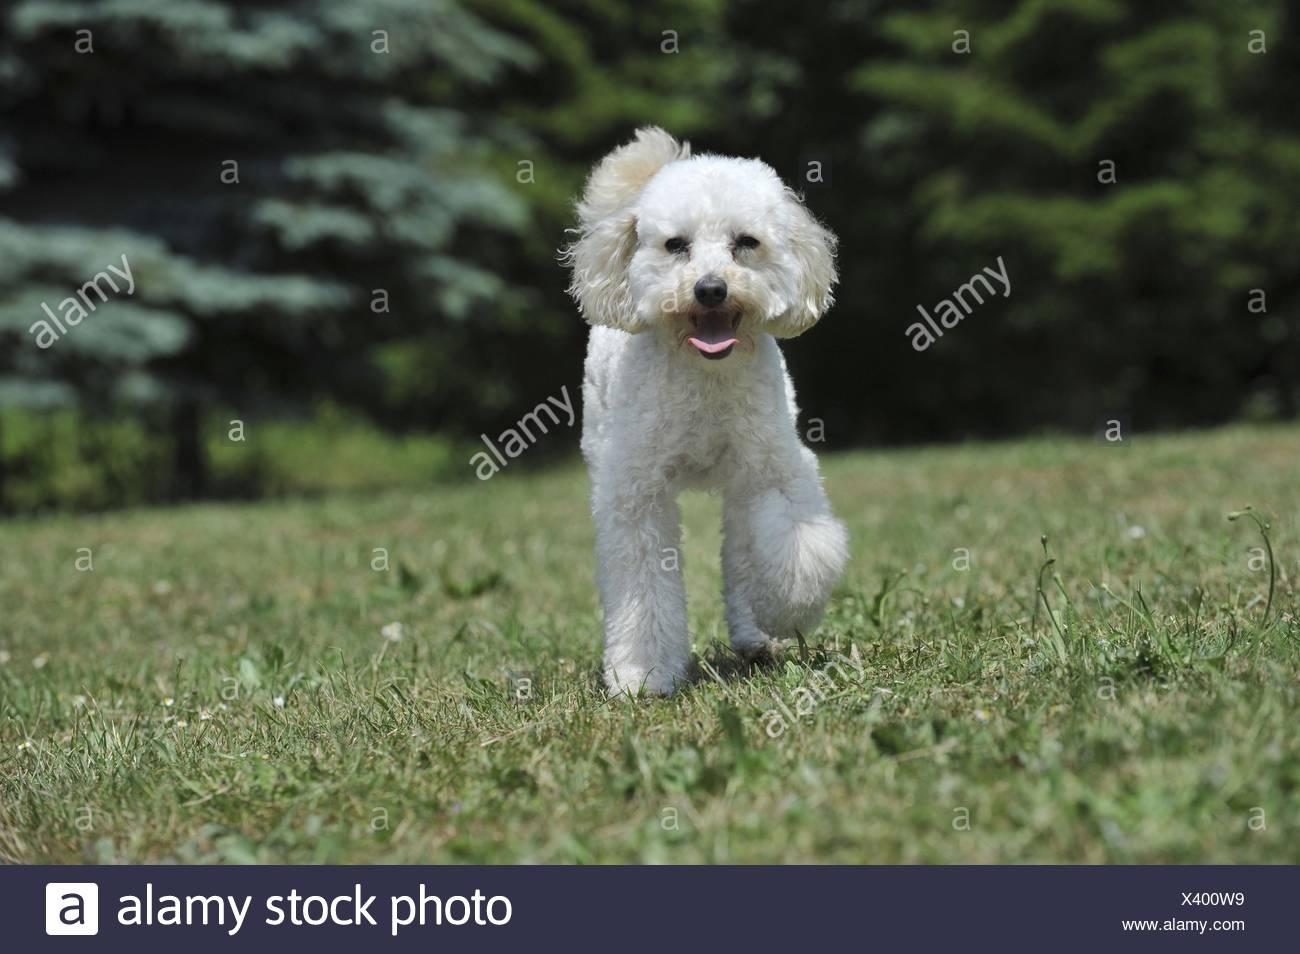 walking Poodle - Stock Image